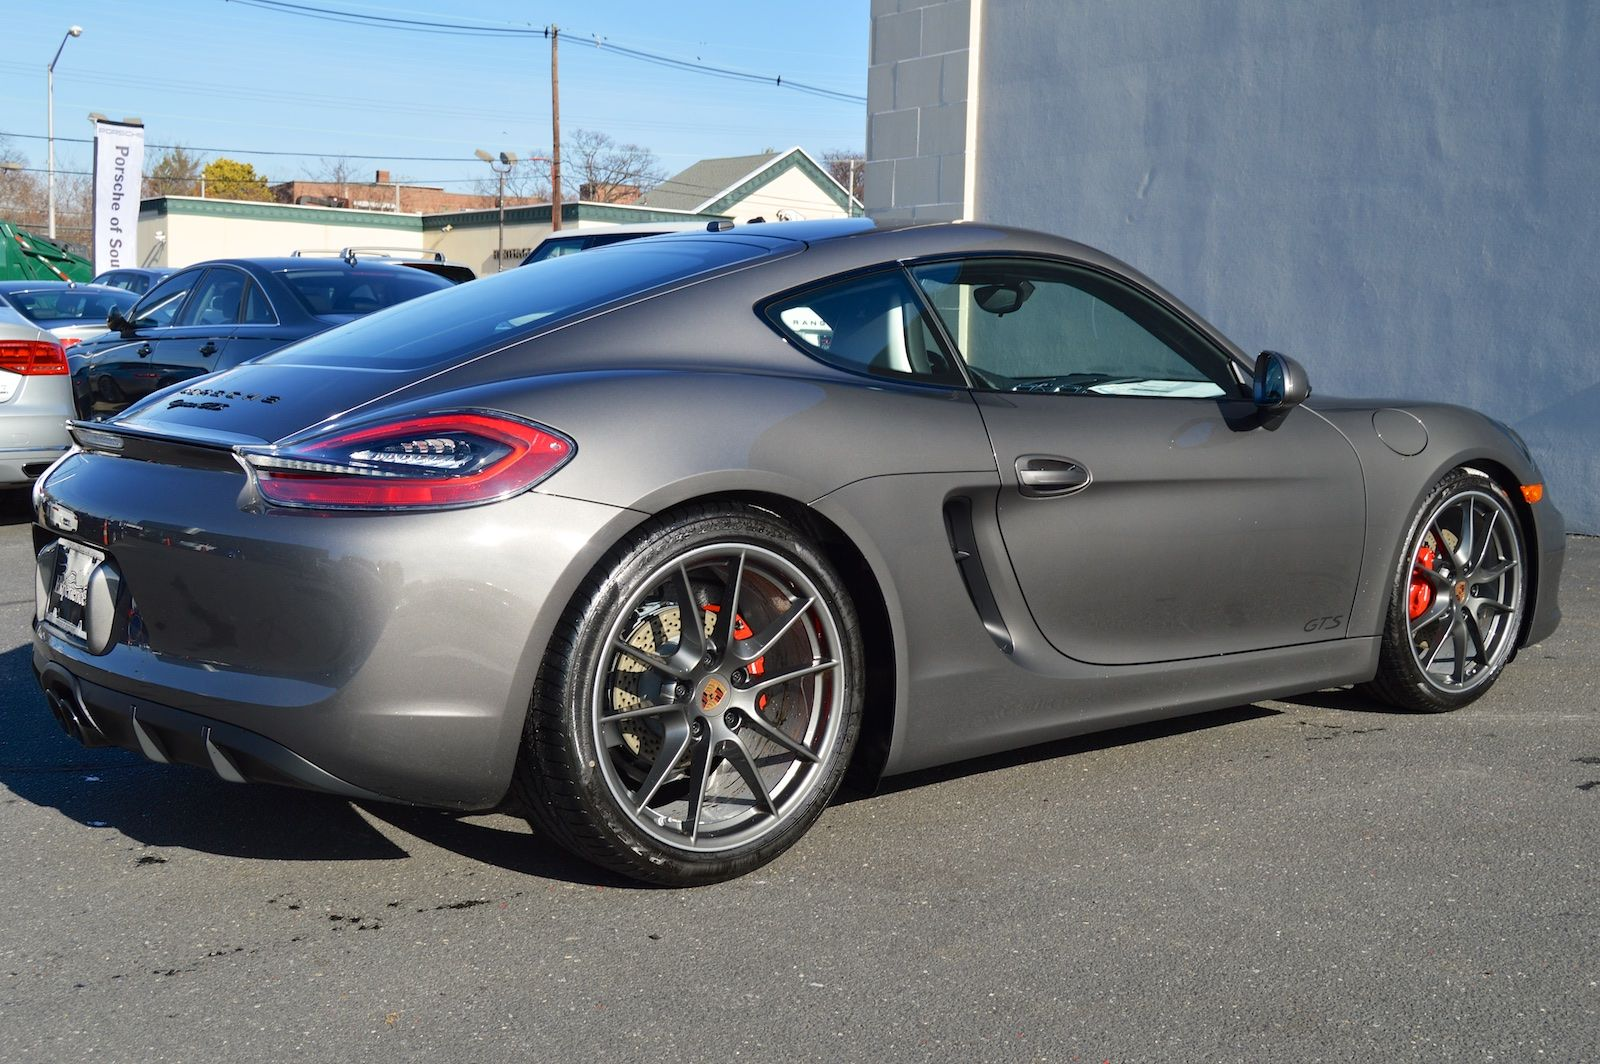 Porsche cayman gts images agate google search